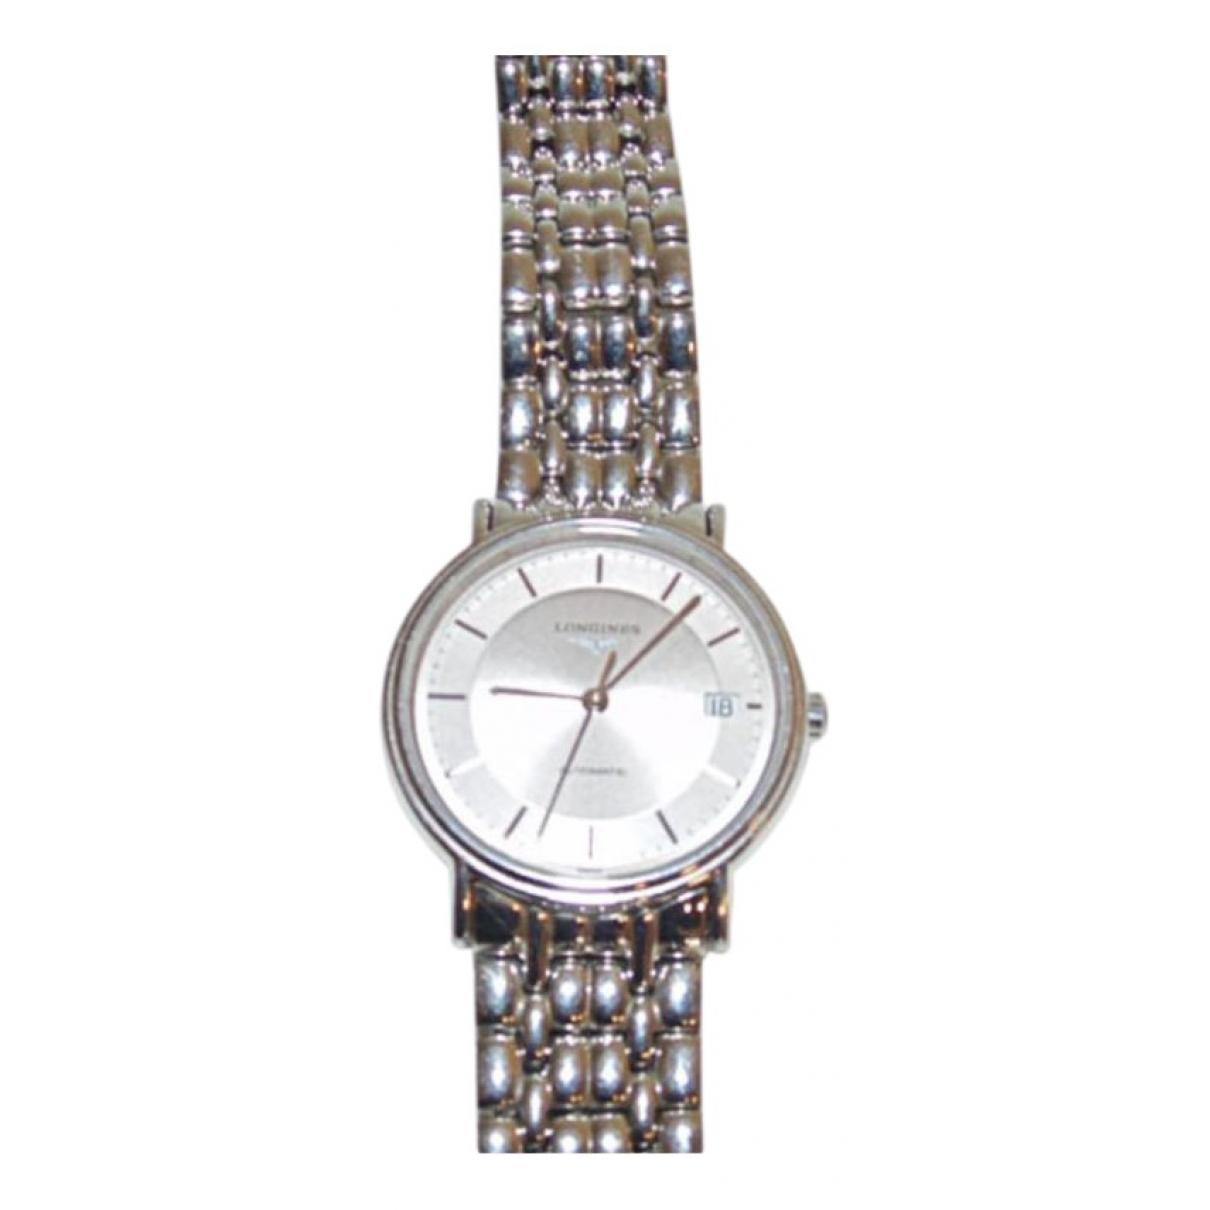 Longines \N Uhr in  Silber Stahl